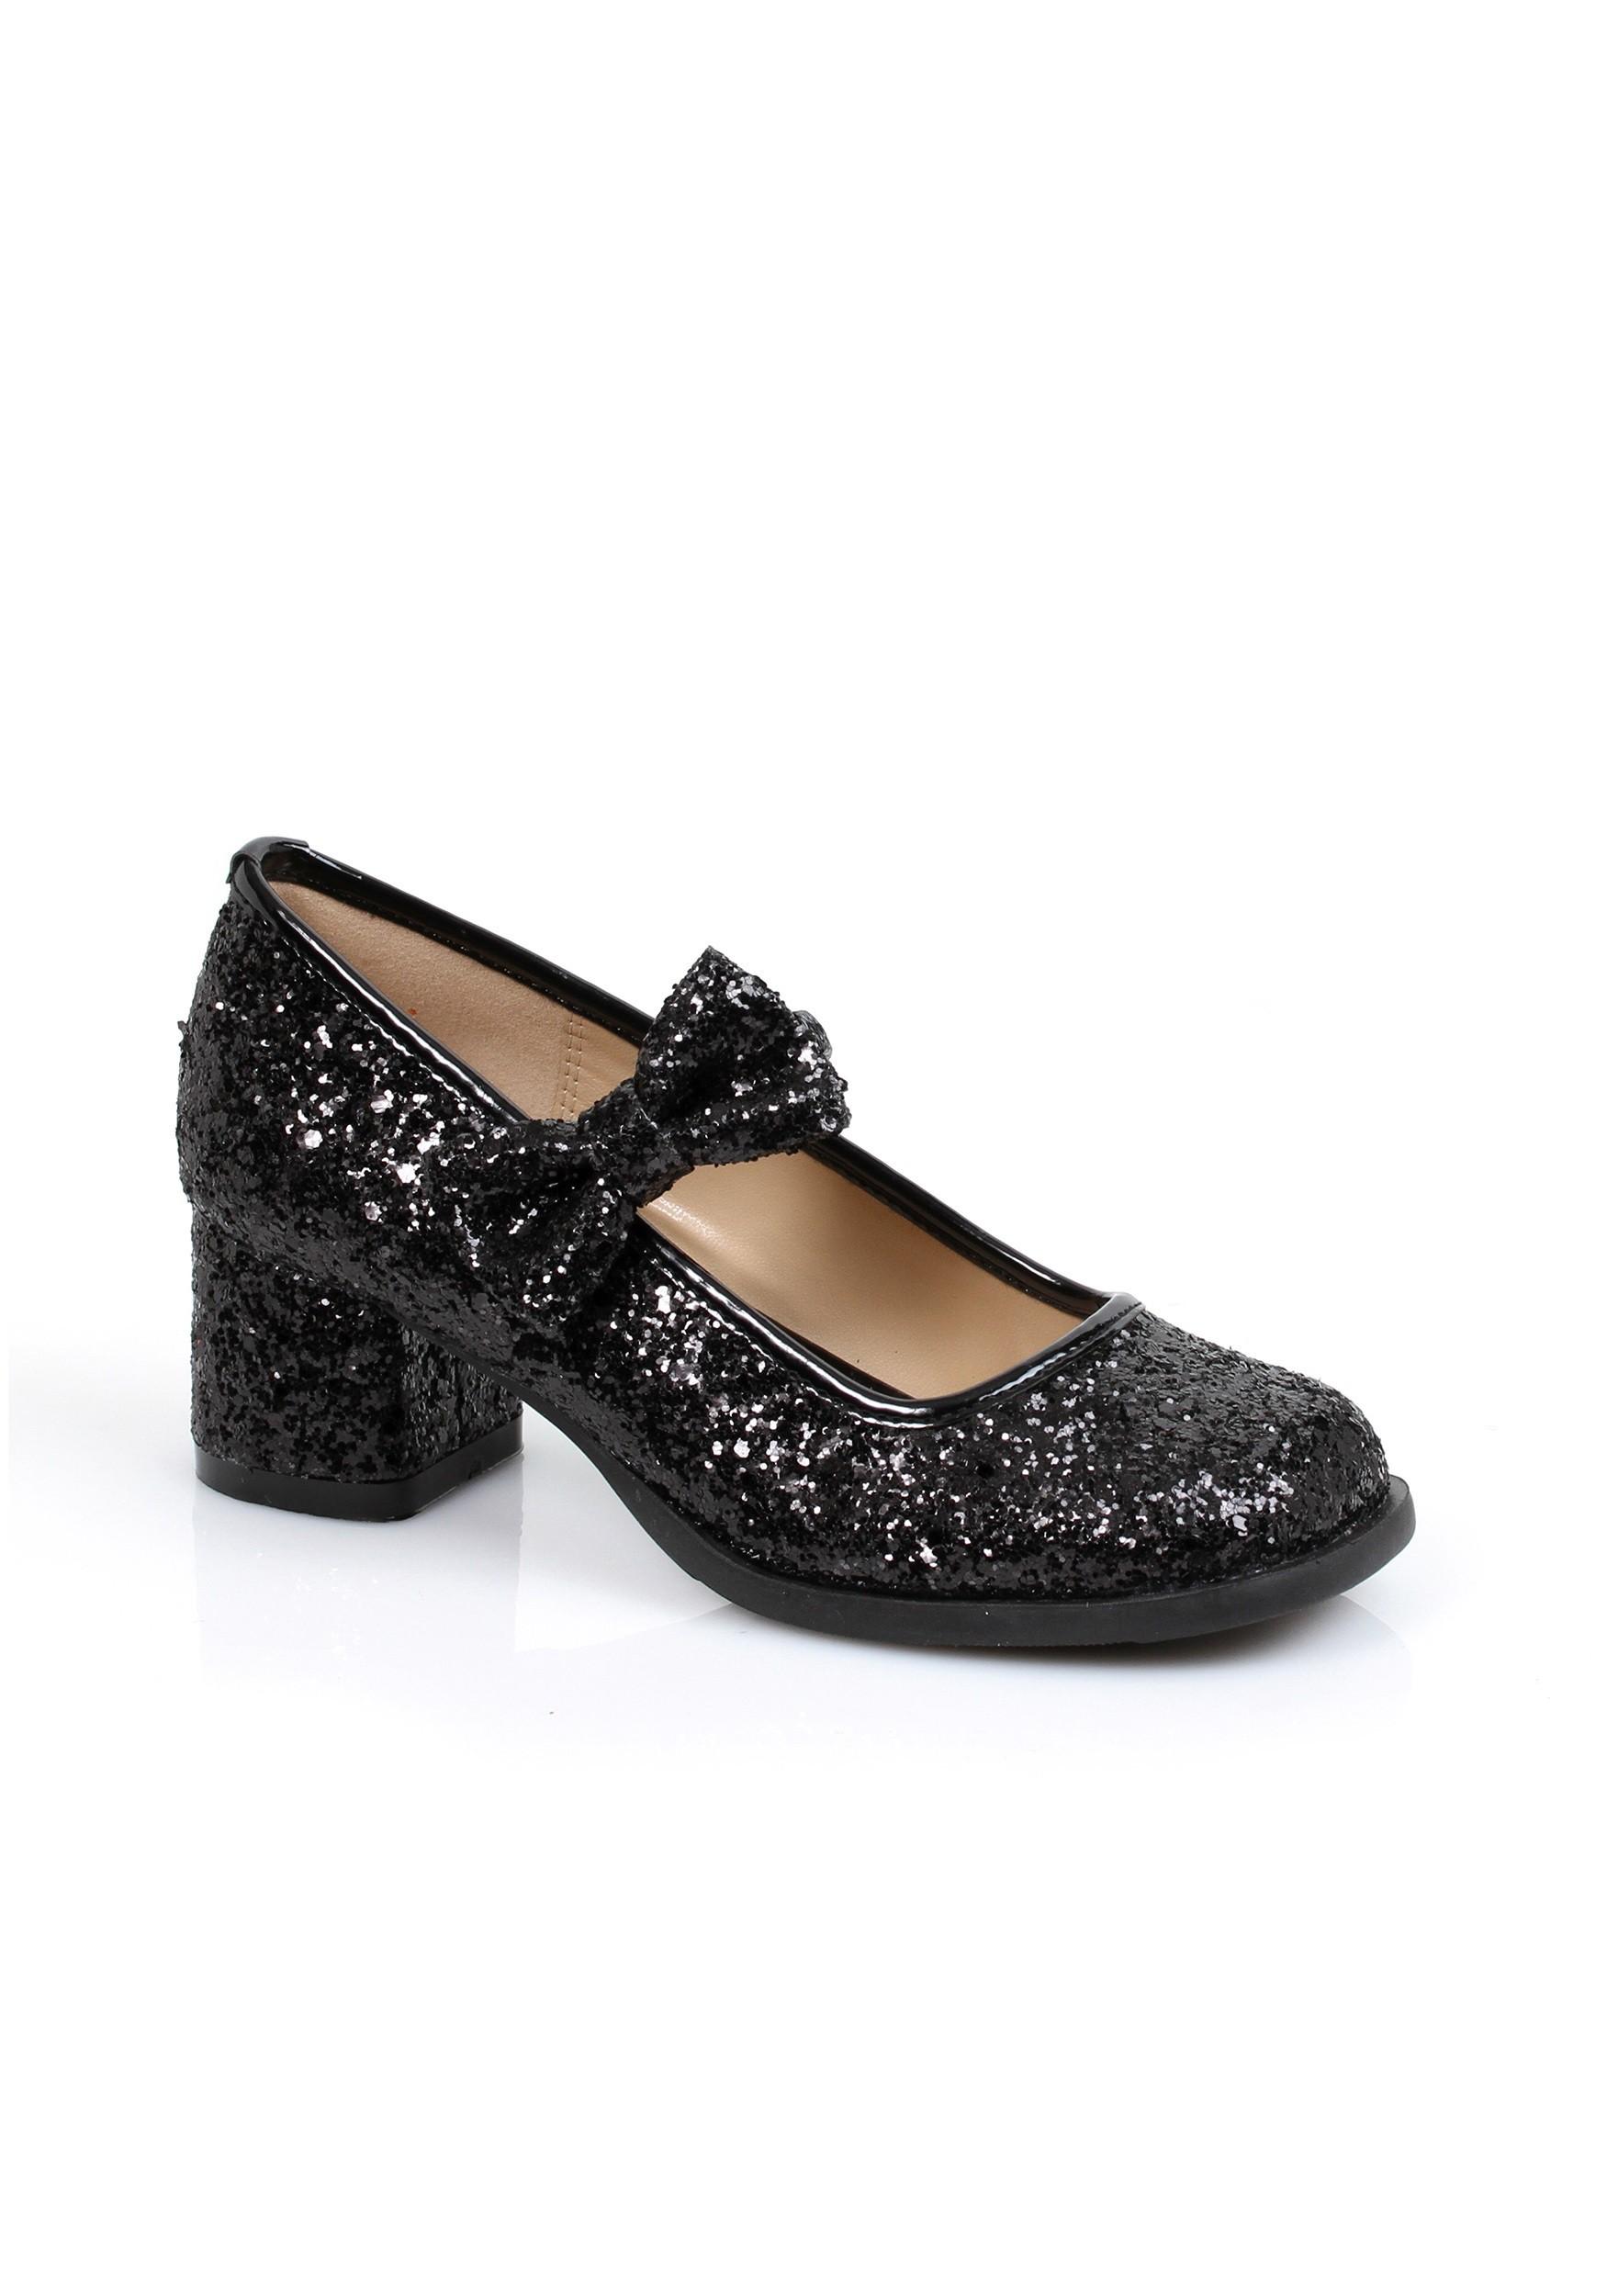 girls-black-glitter-heels.jpg a4e702169